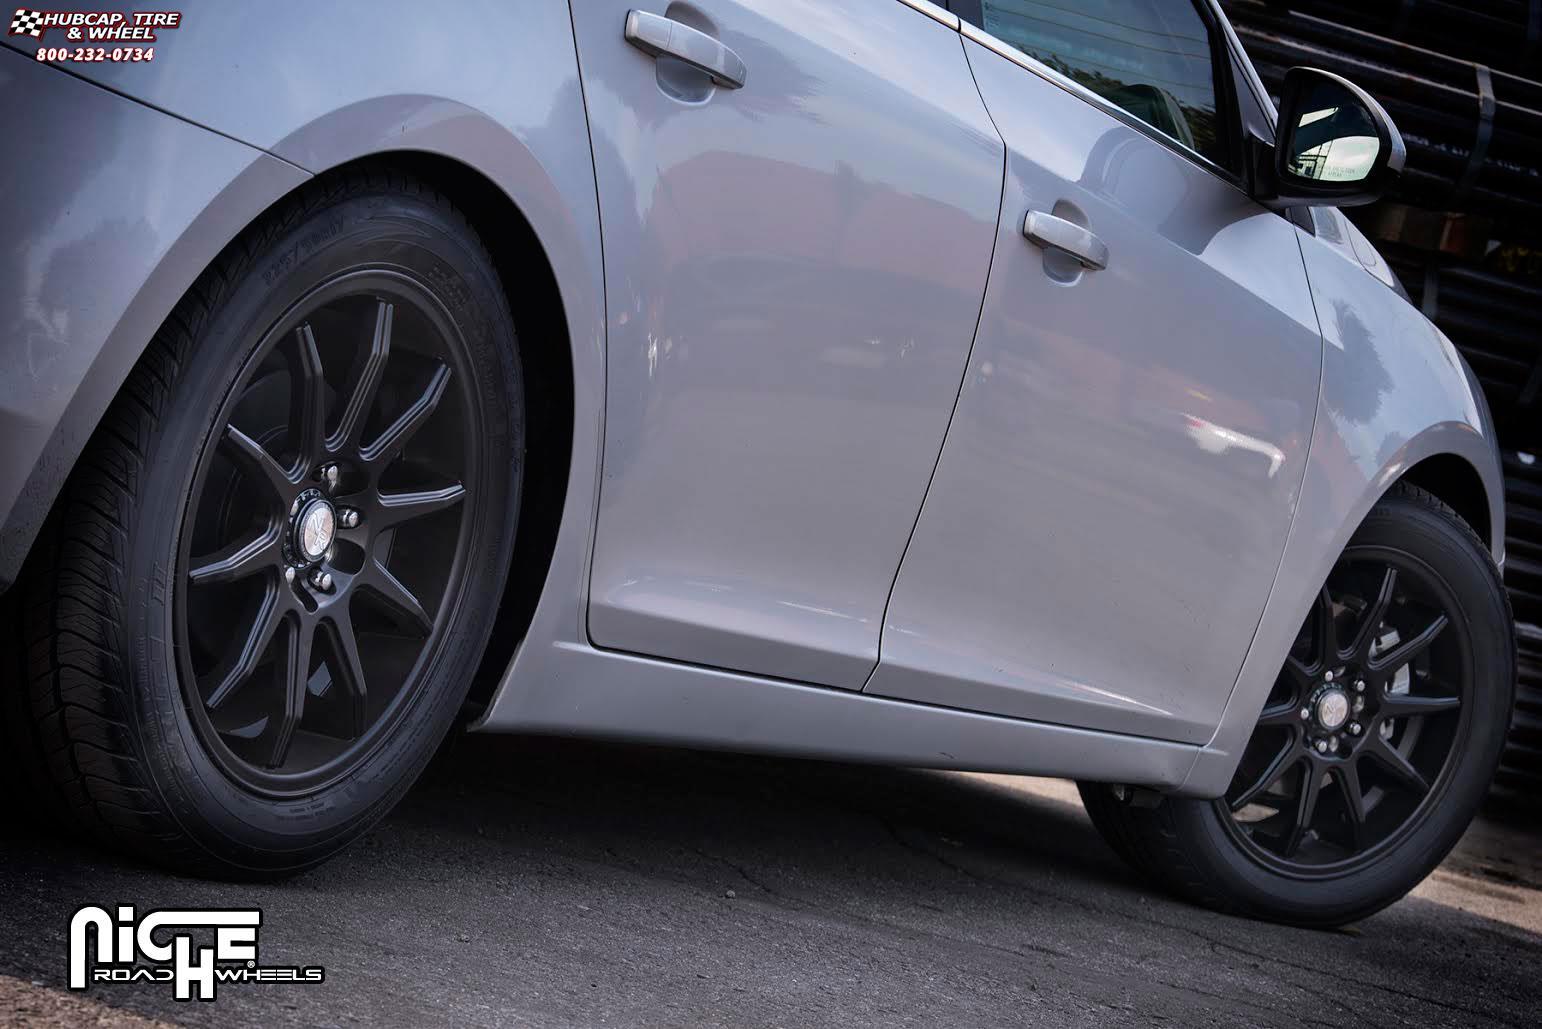 2013 Chevy Cruze Tire Size >> Chevrolet Cruze Niche NR10 - M122 Wheels Matte Black